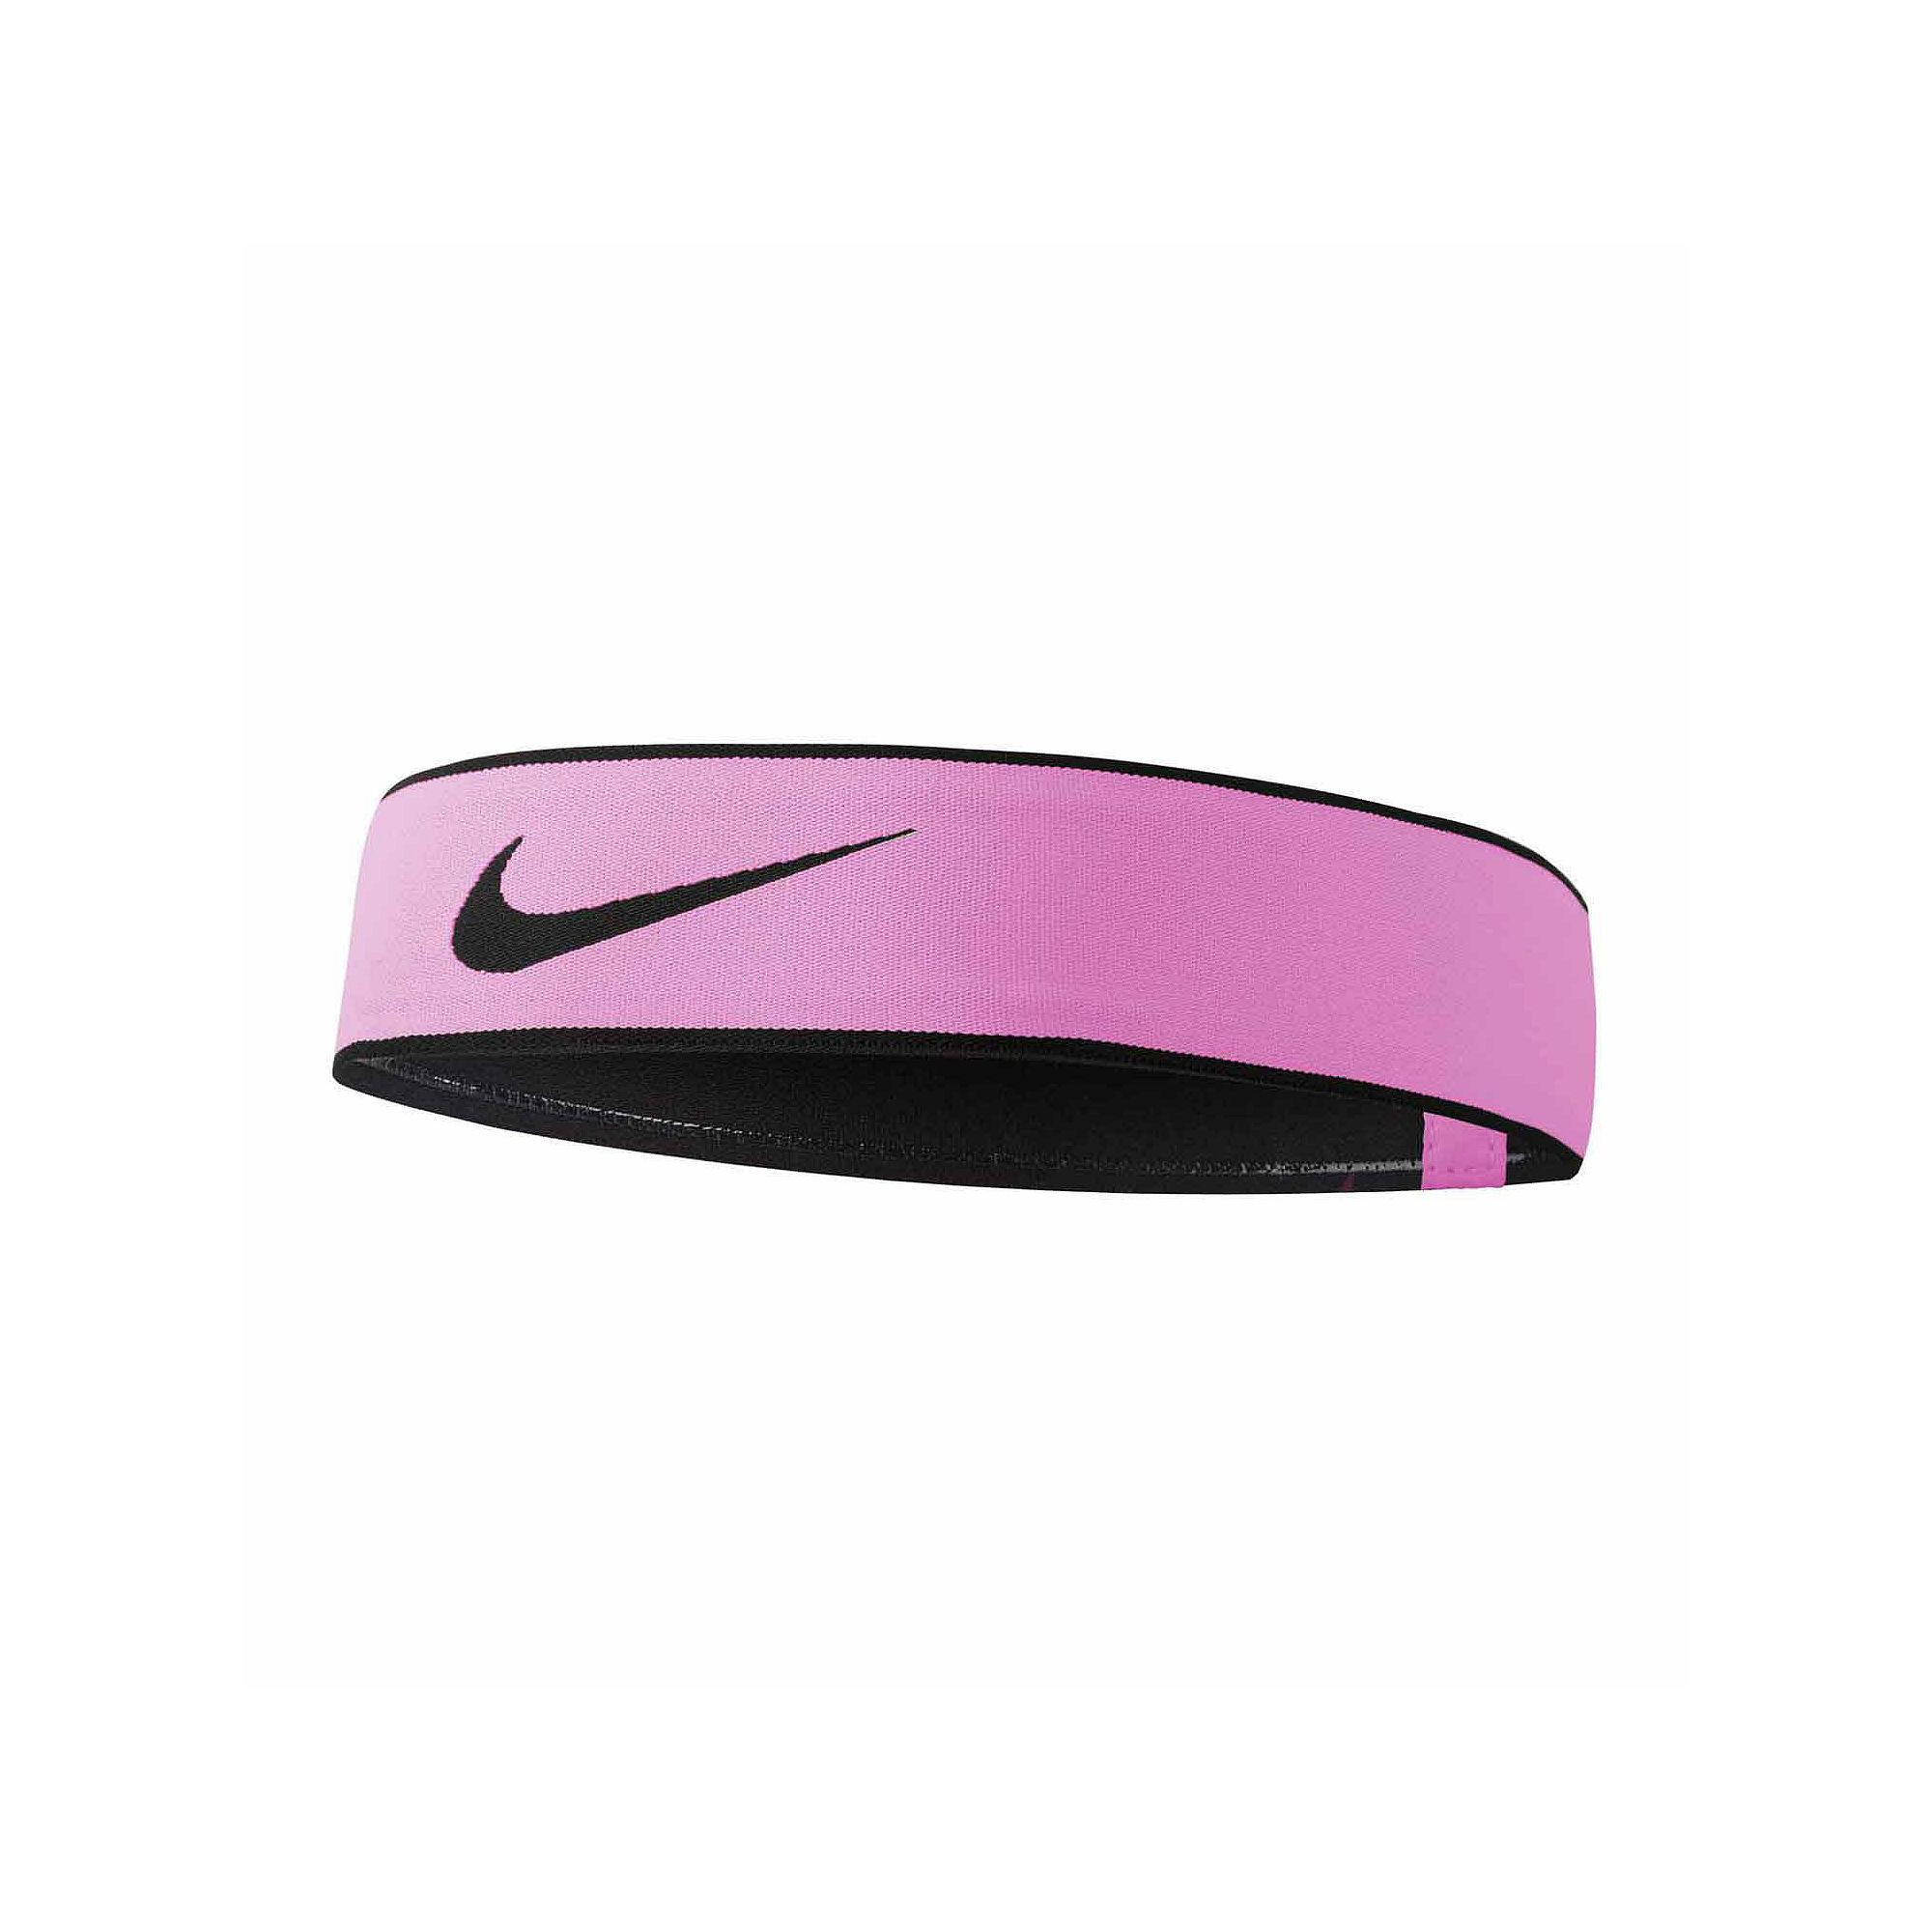 Nike Pro Swoosh Headband, Adult Unisex, Black